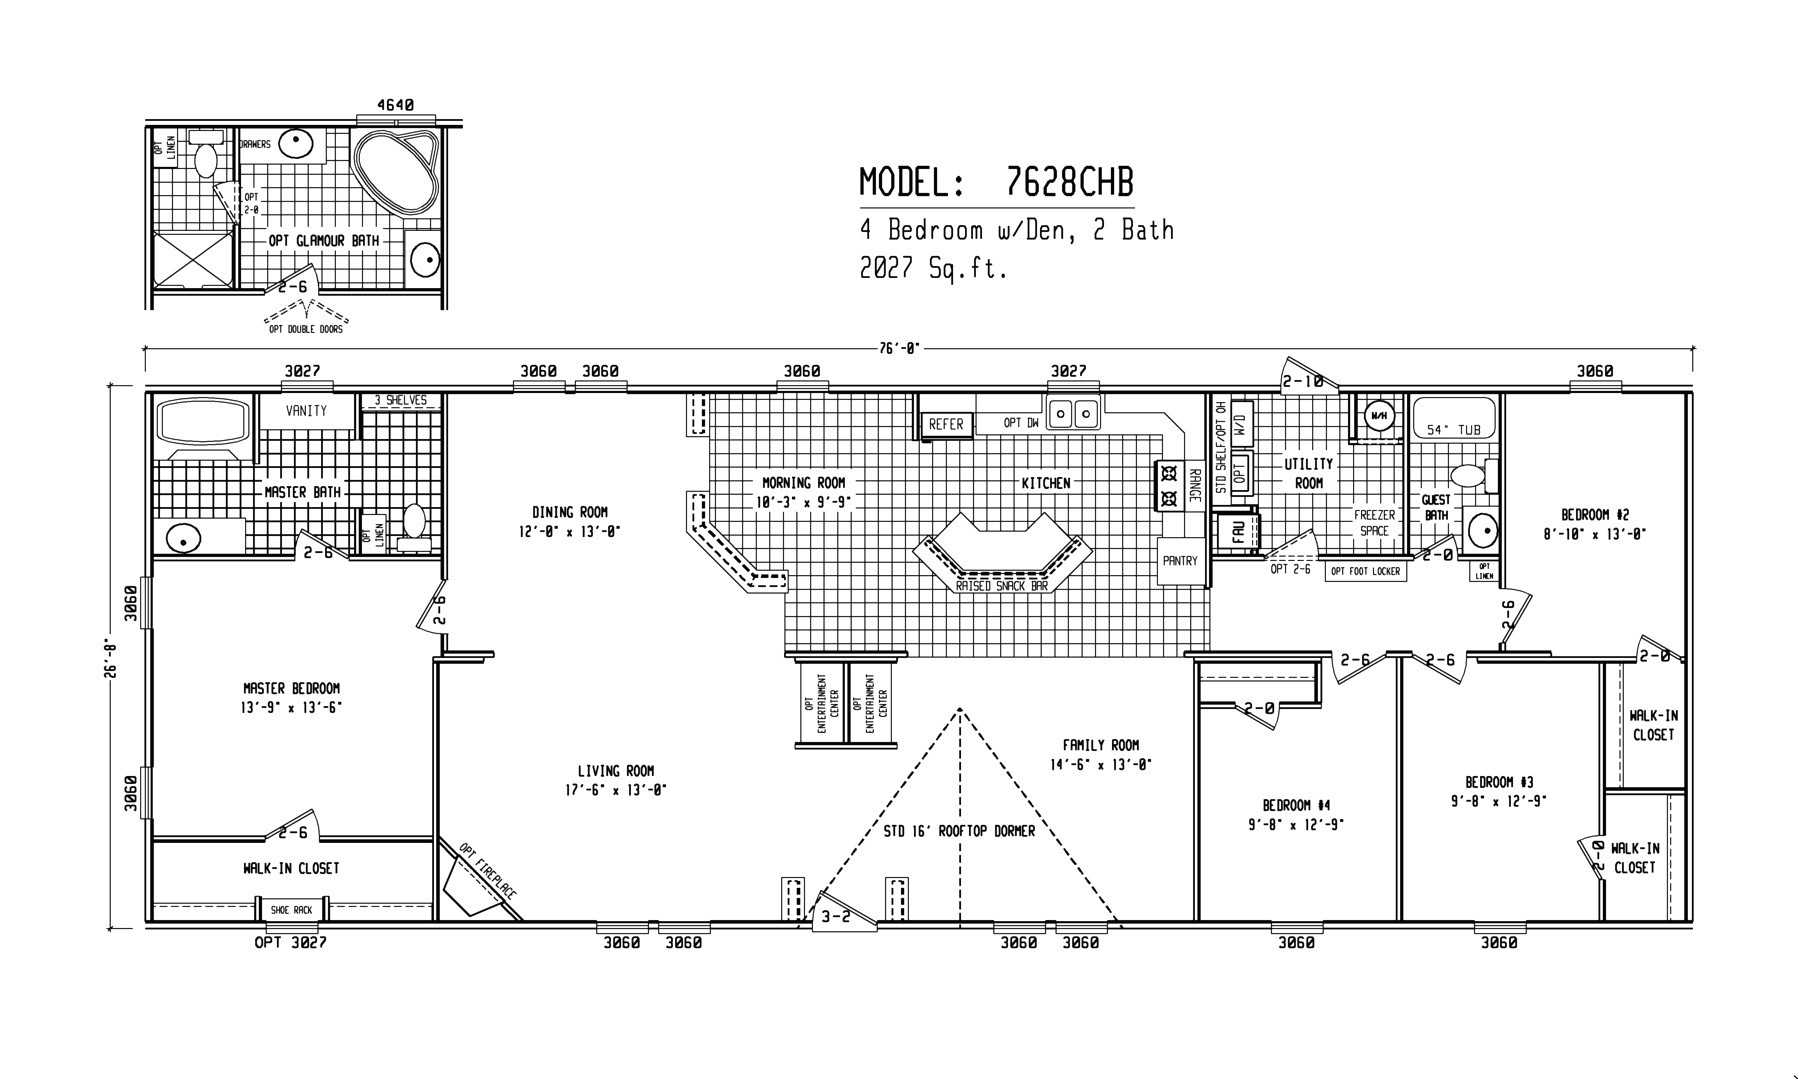 1997 fleetwood double wide mobile home luxury fleetwood mobile homes floor plans fresh 4 bedroom mobile home floor